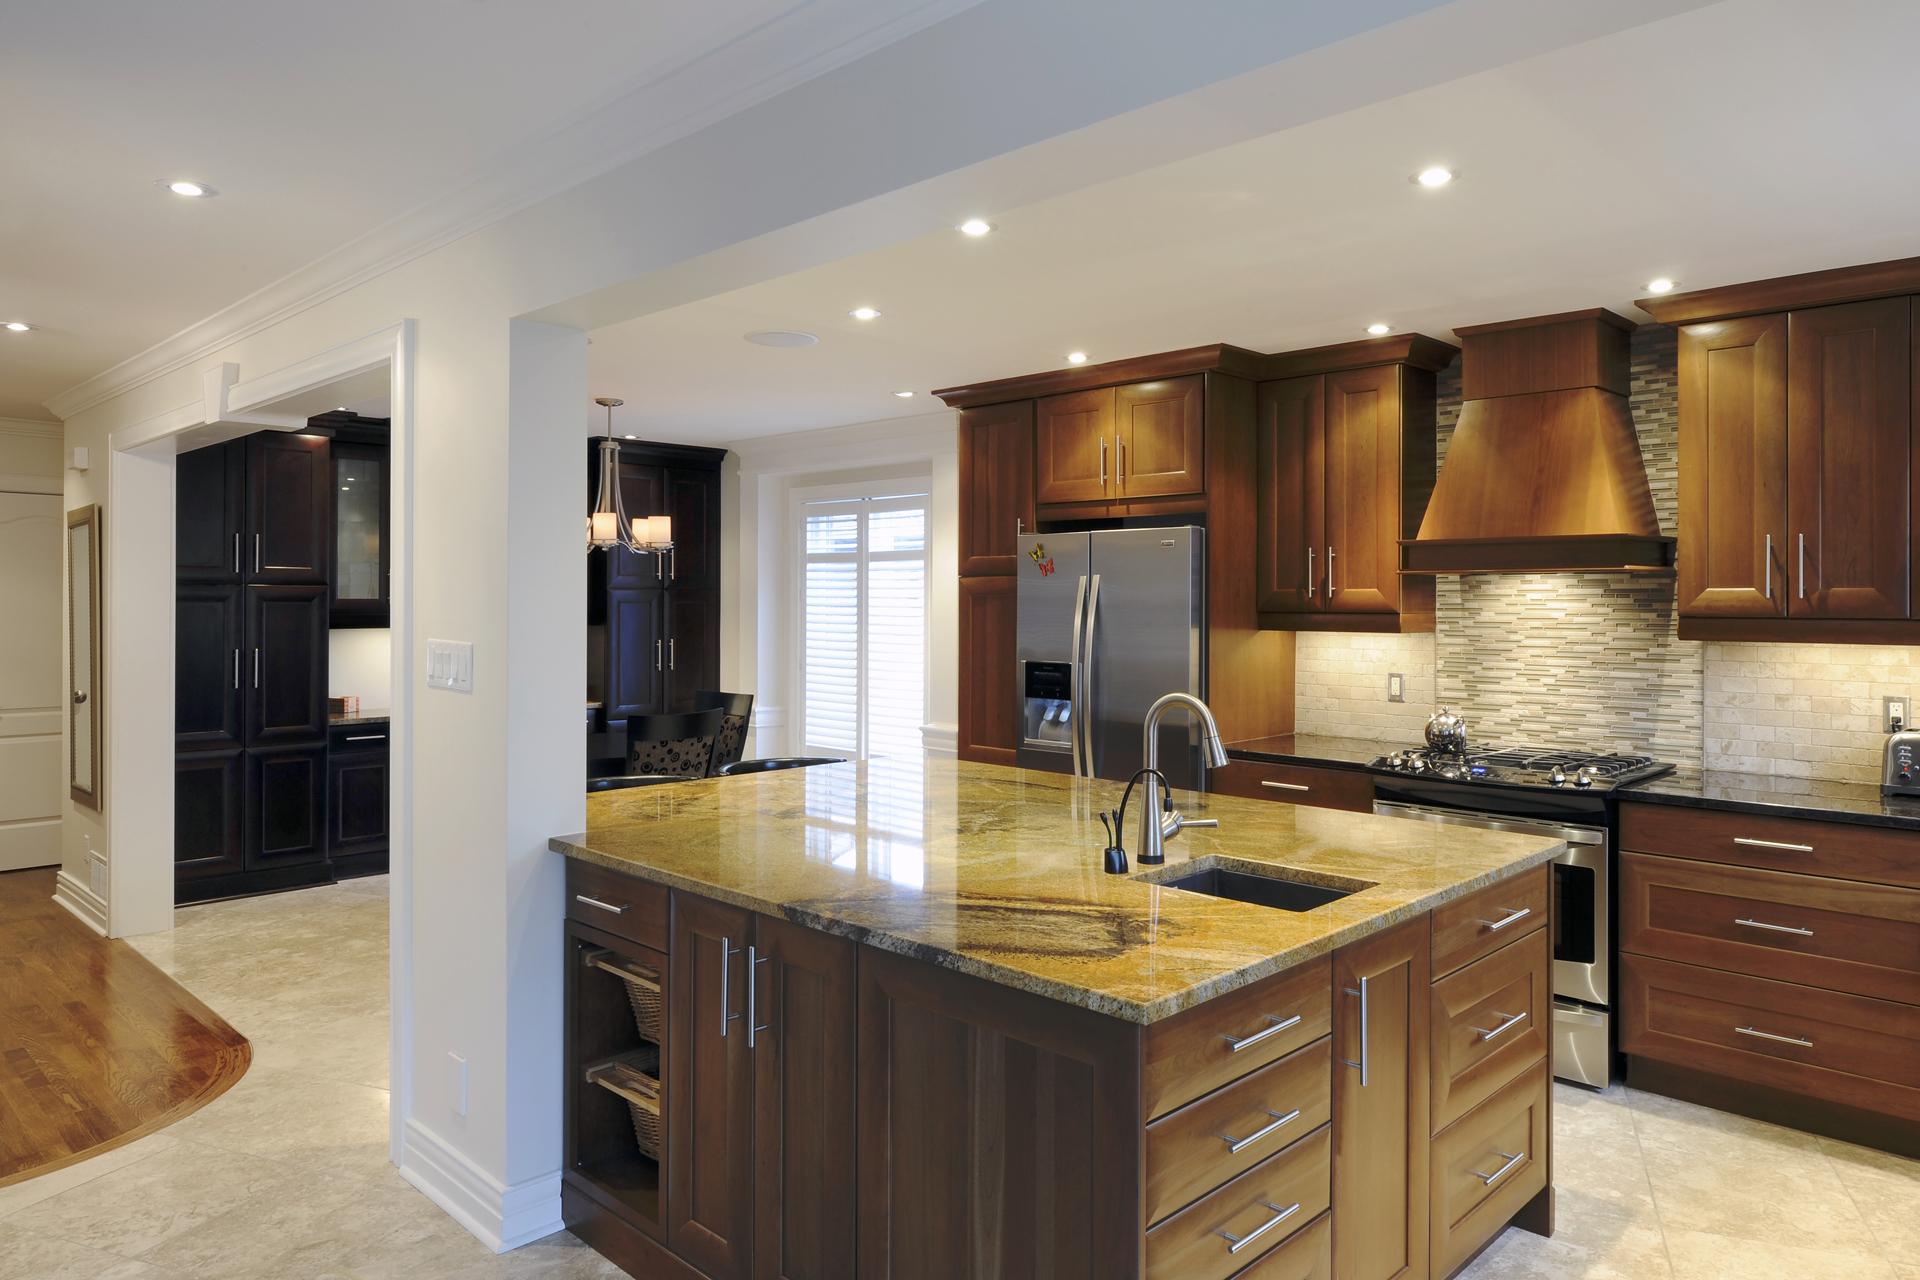 Santoro kitchen 2.jpg